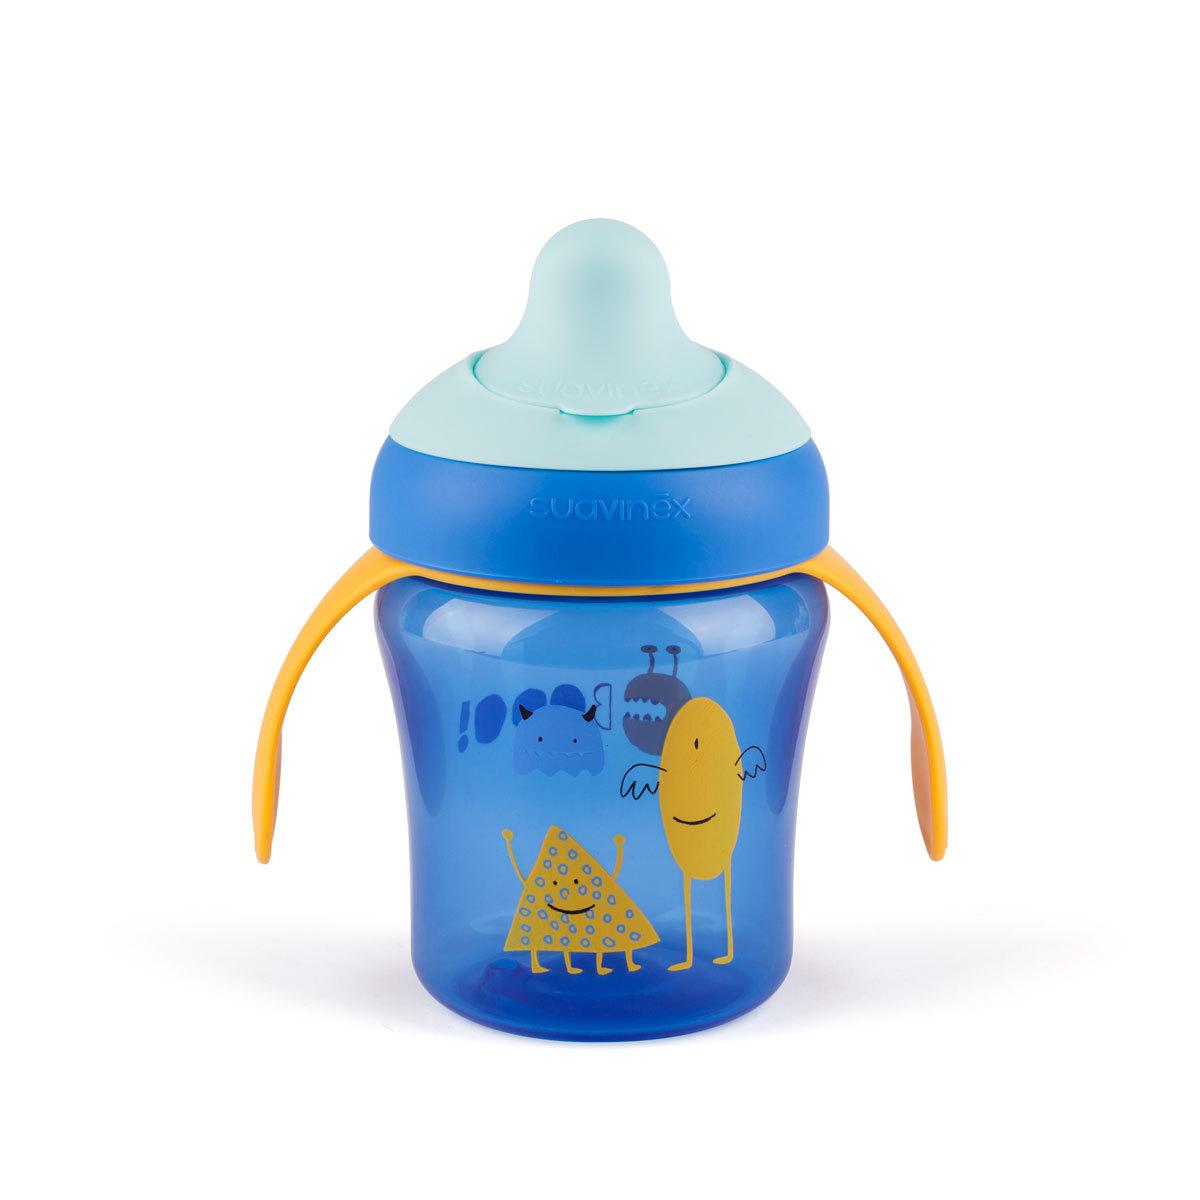 Tasse & Verre Tasse d'Apprentissage Booo - Bleu Tasse d'Apprentissage Booo - Bleu